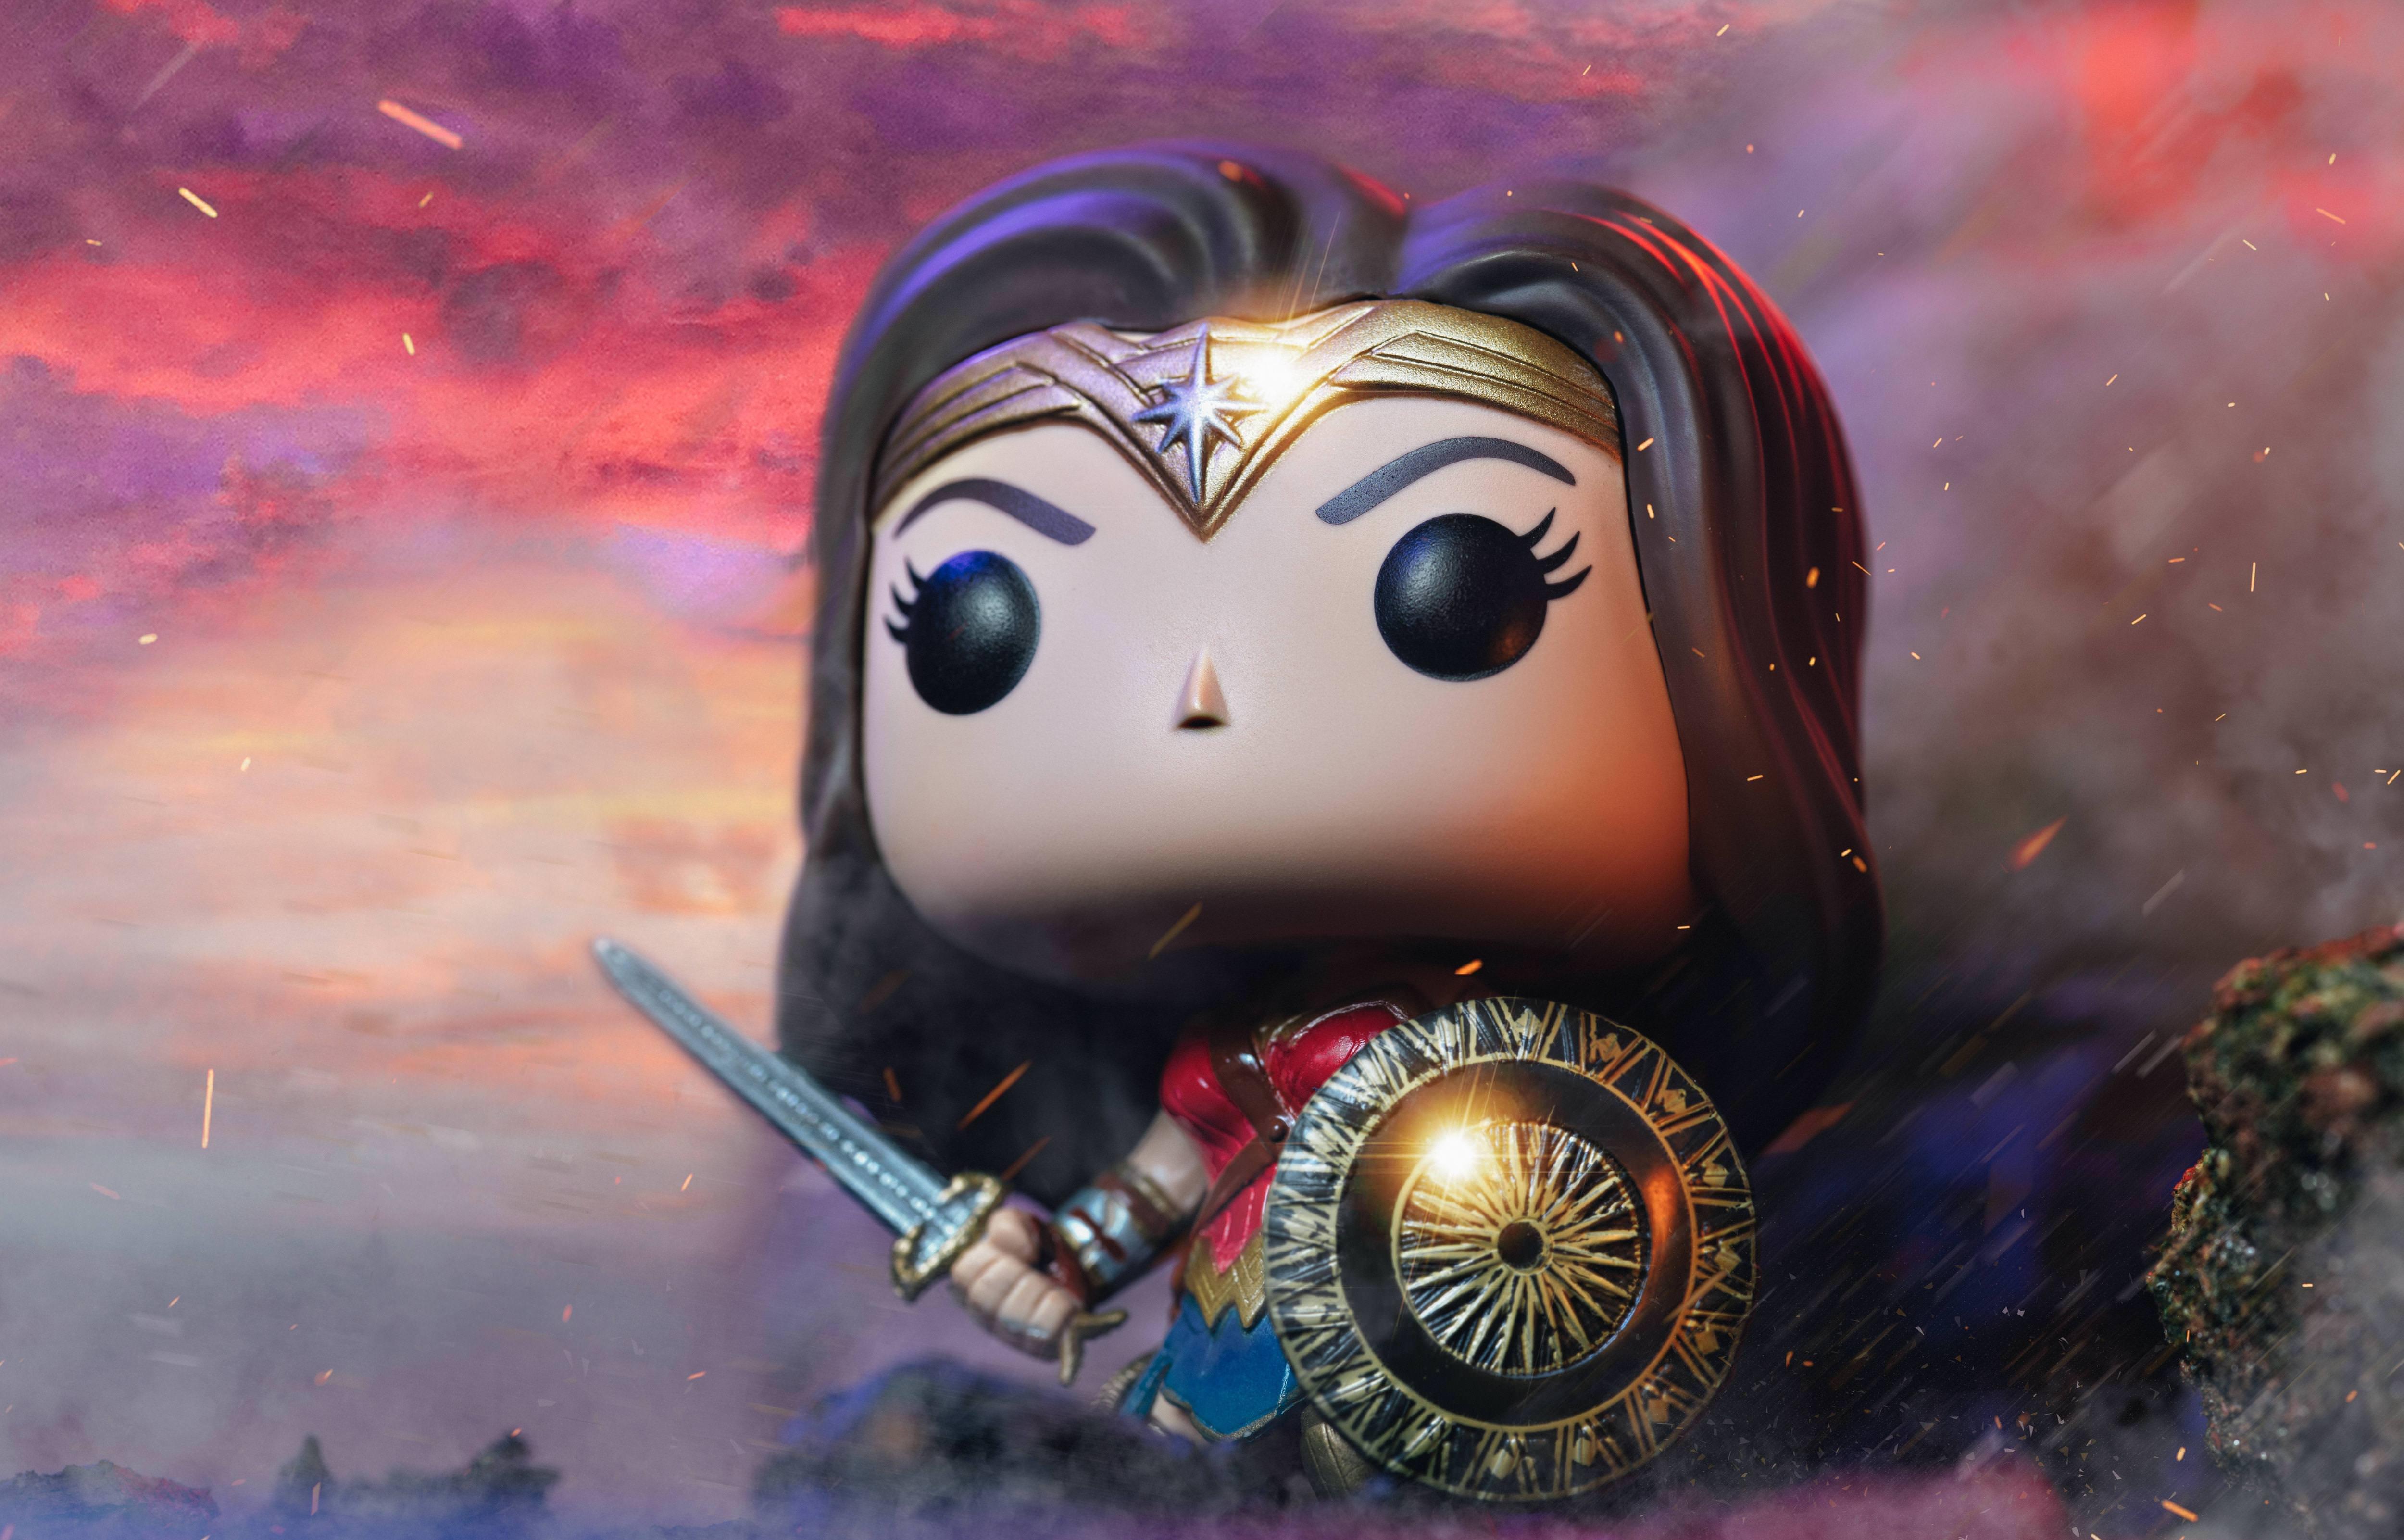 Wallpaper Wonder Woman Diana Prince Gal Gadot HD Movies